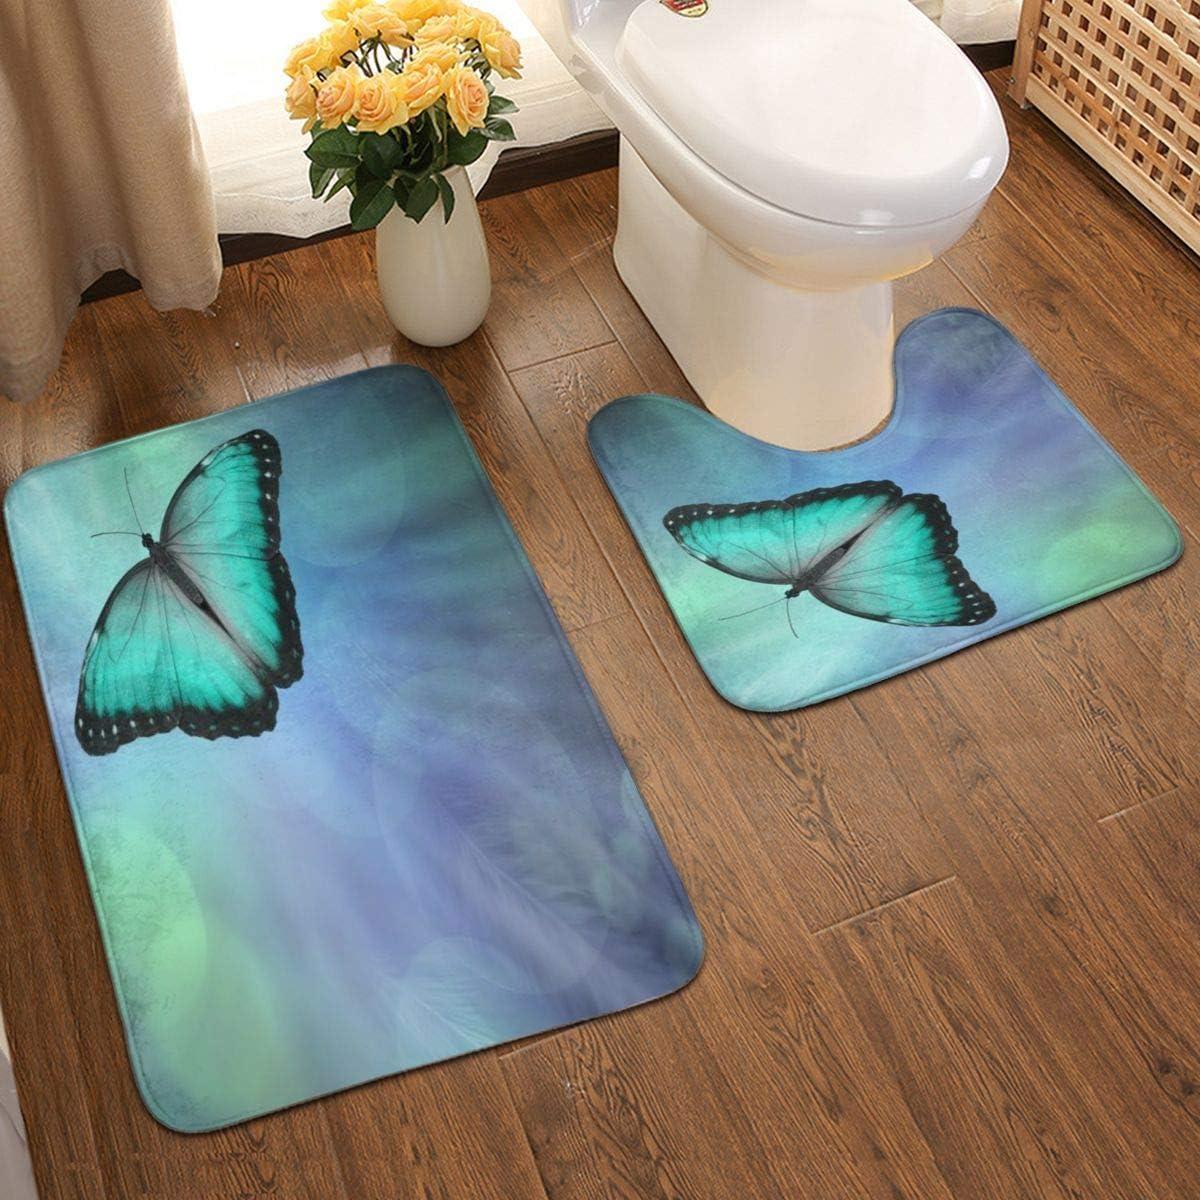 Amazon Com Lone Jade Green Coloured Butterfly Bathroom Antiskid Pad 2 Pieces Bathroom Rugs Set Door Floors Soft Bath Mats Carpet For Tub Shower Customized Home Kitchen